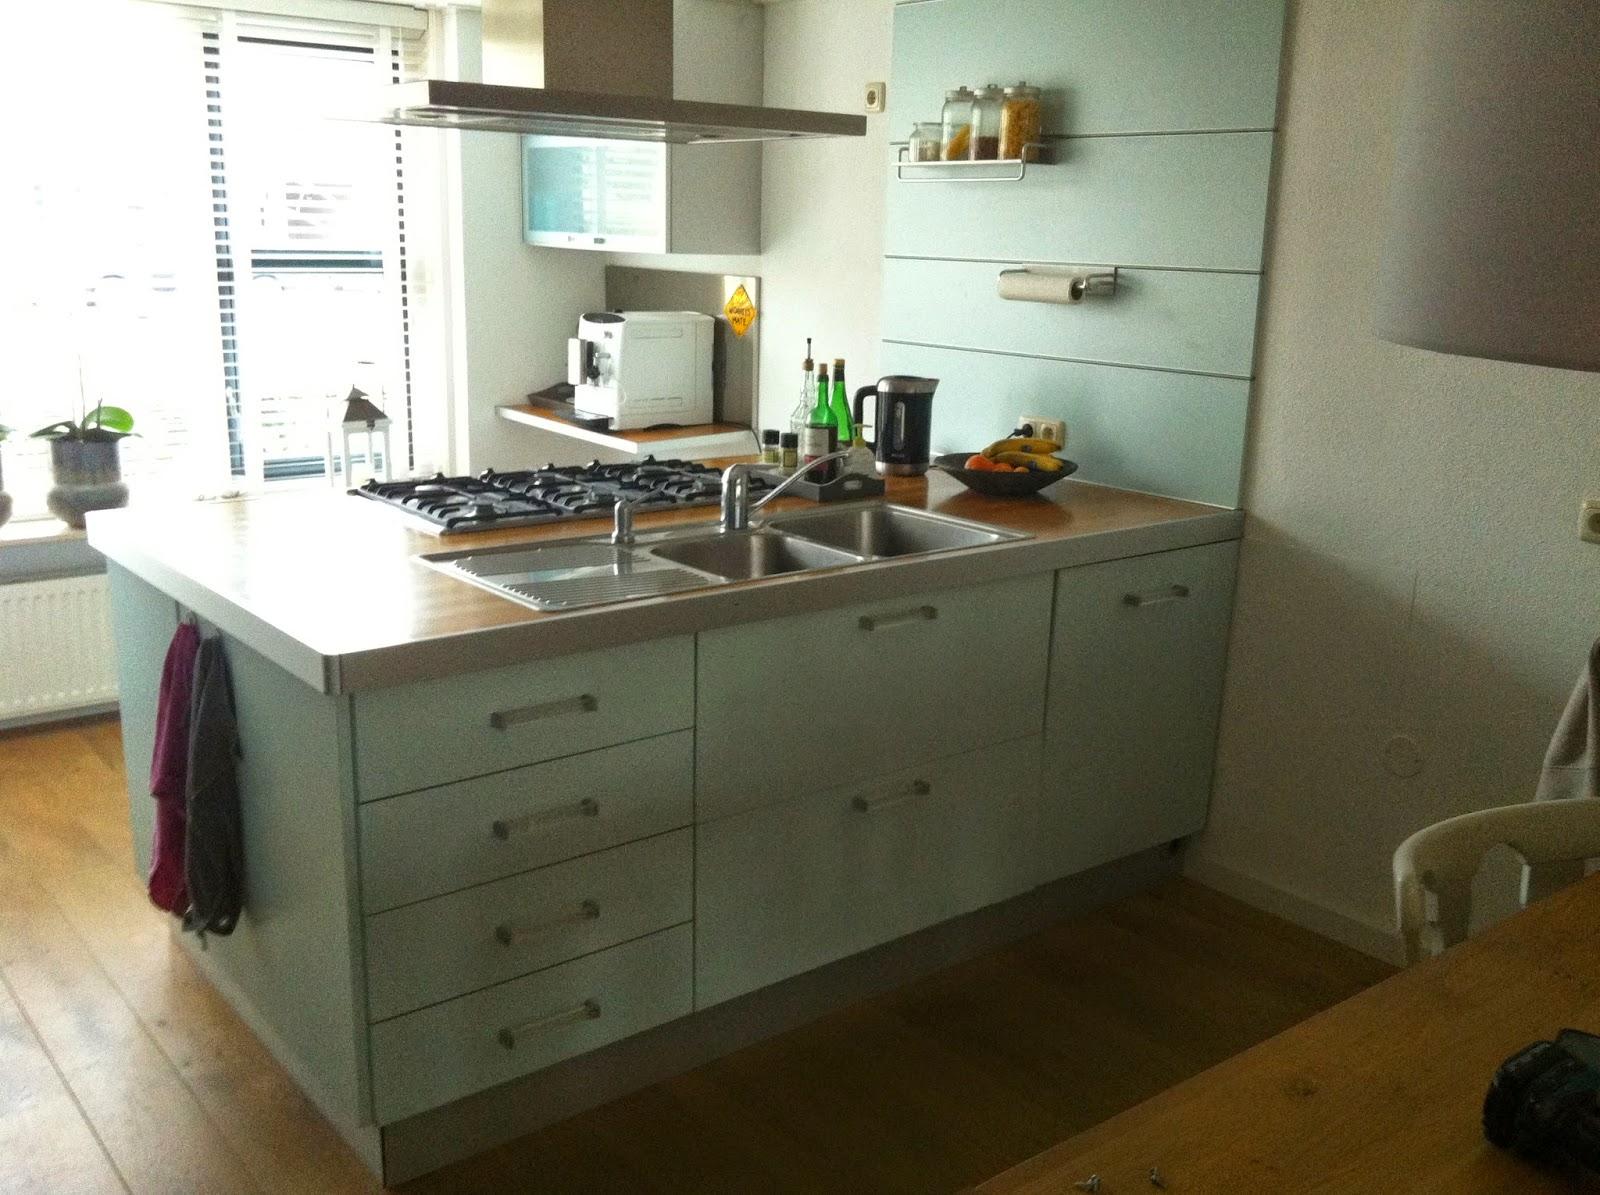 Restylelin DIY Keuken in de verf